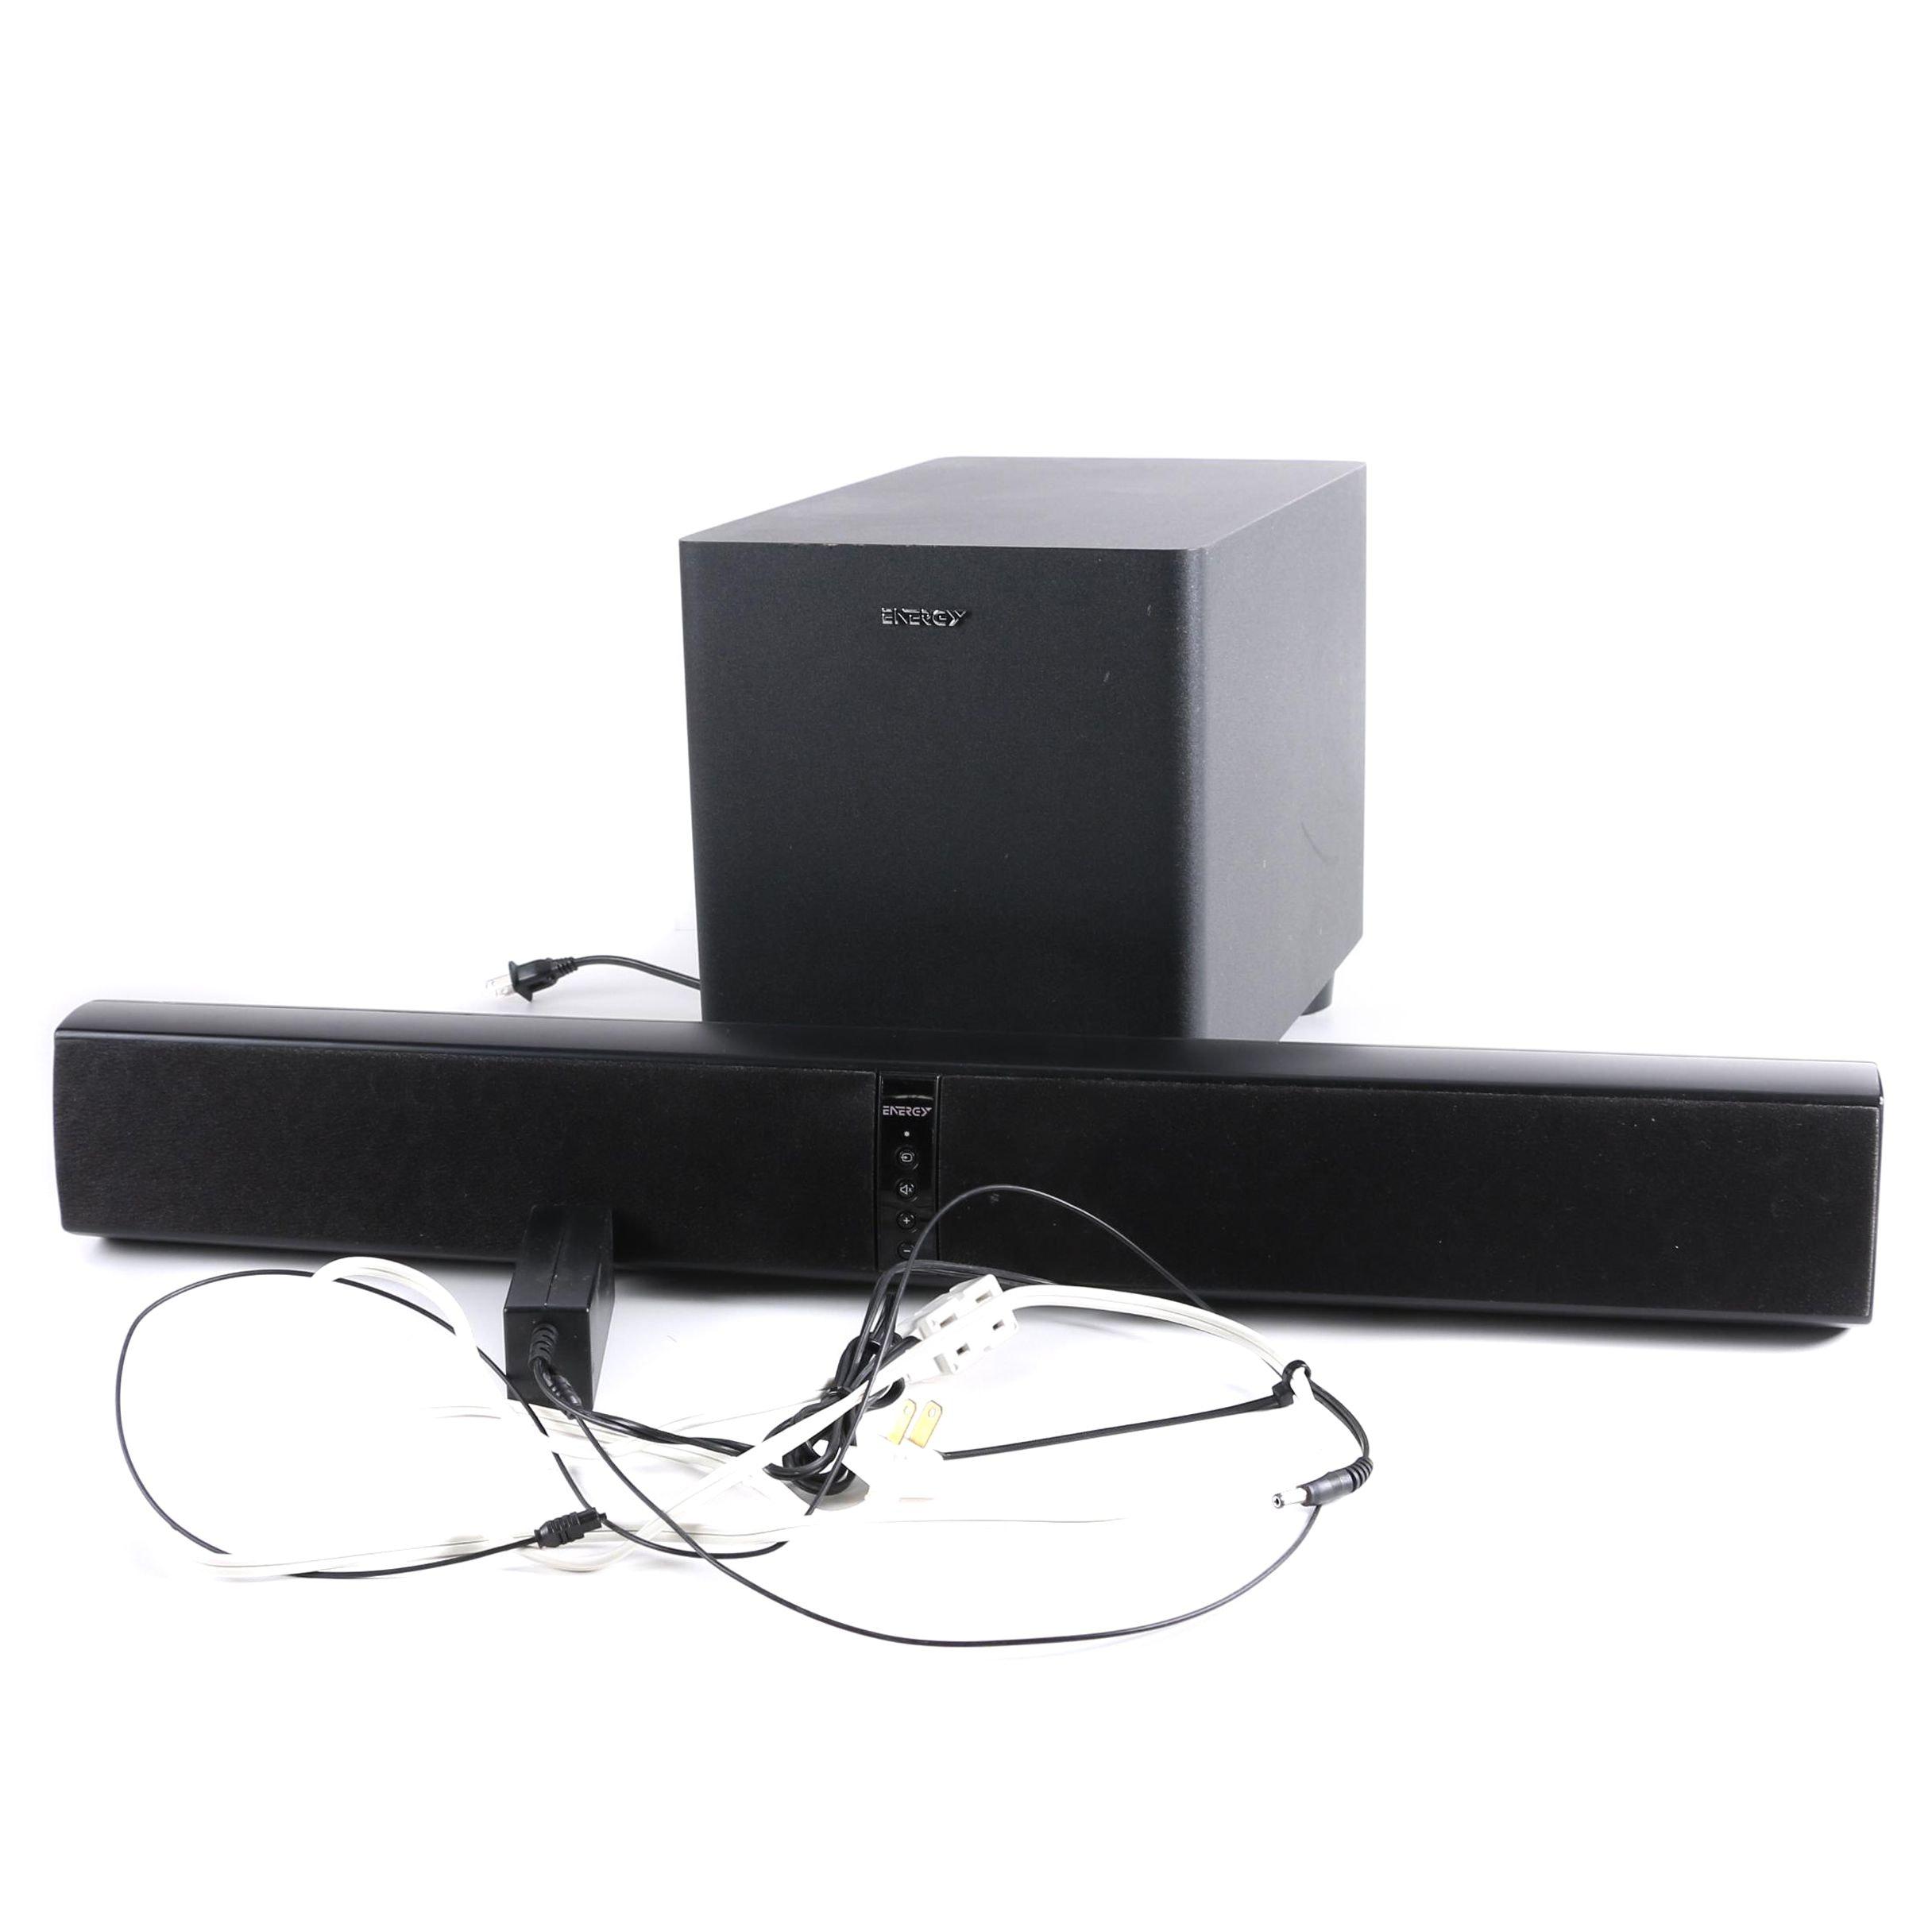 Energy Power Bar Soundbar and Subwoofer